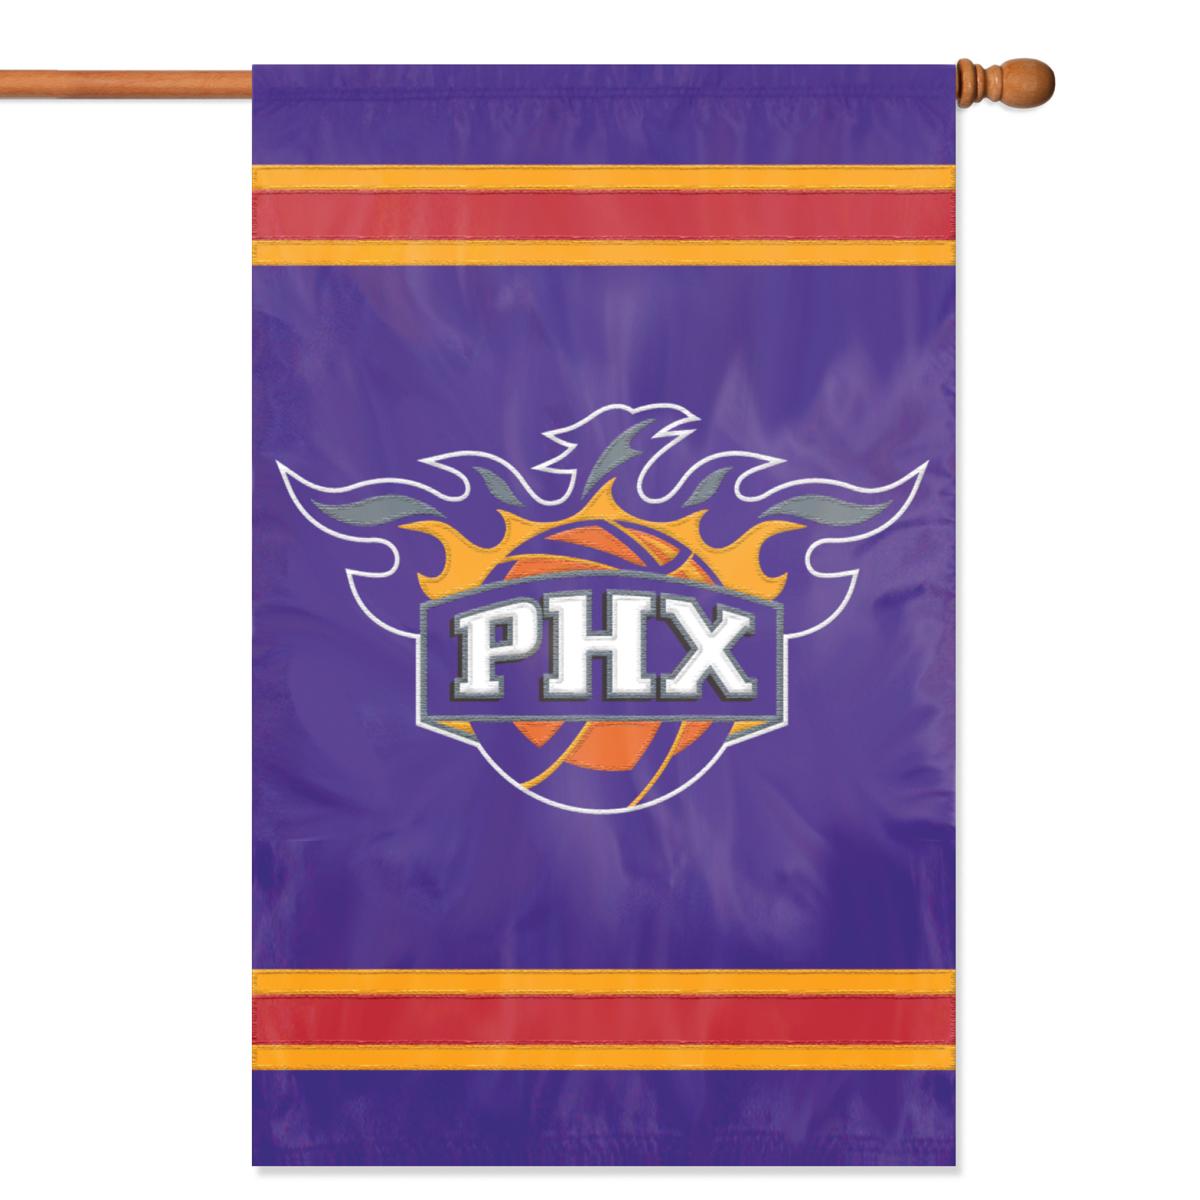 "PHOENIX SUNS 44""x28"" 2-SIDED BANNER FLAG"